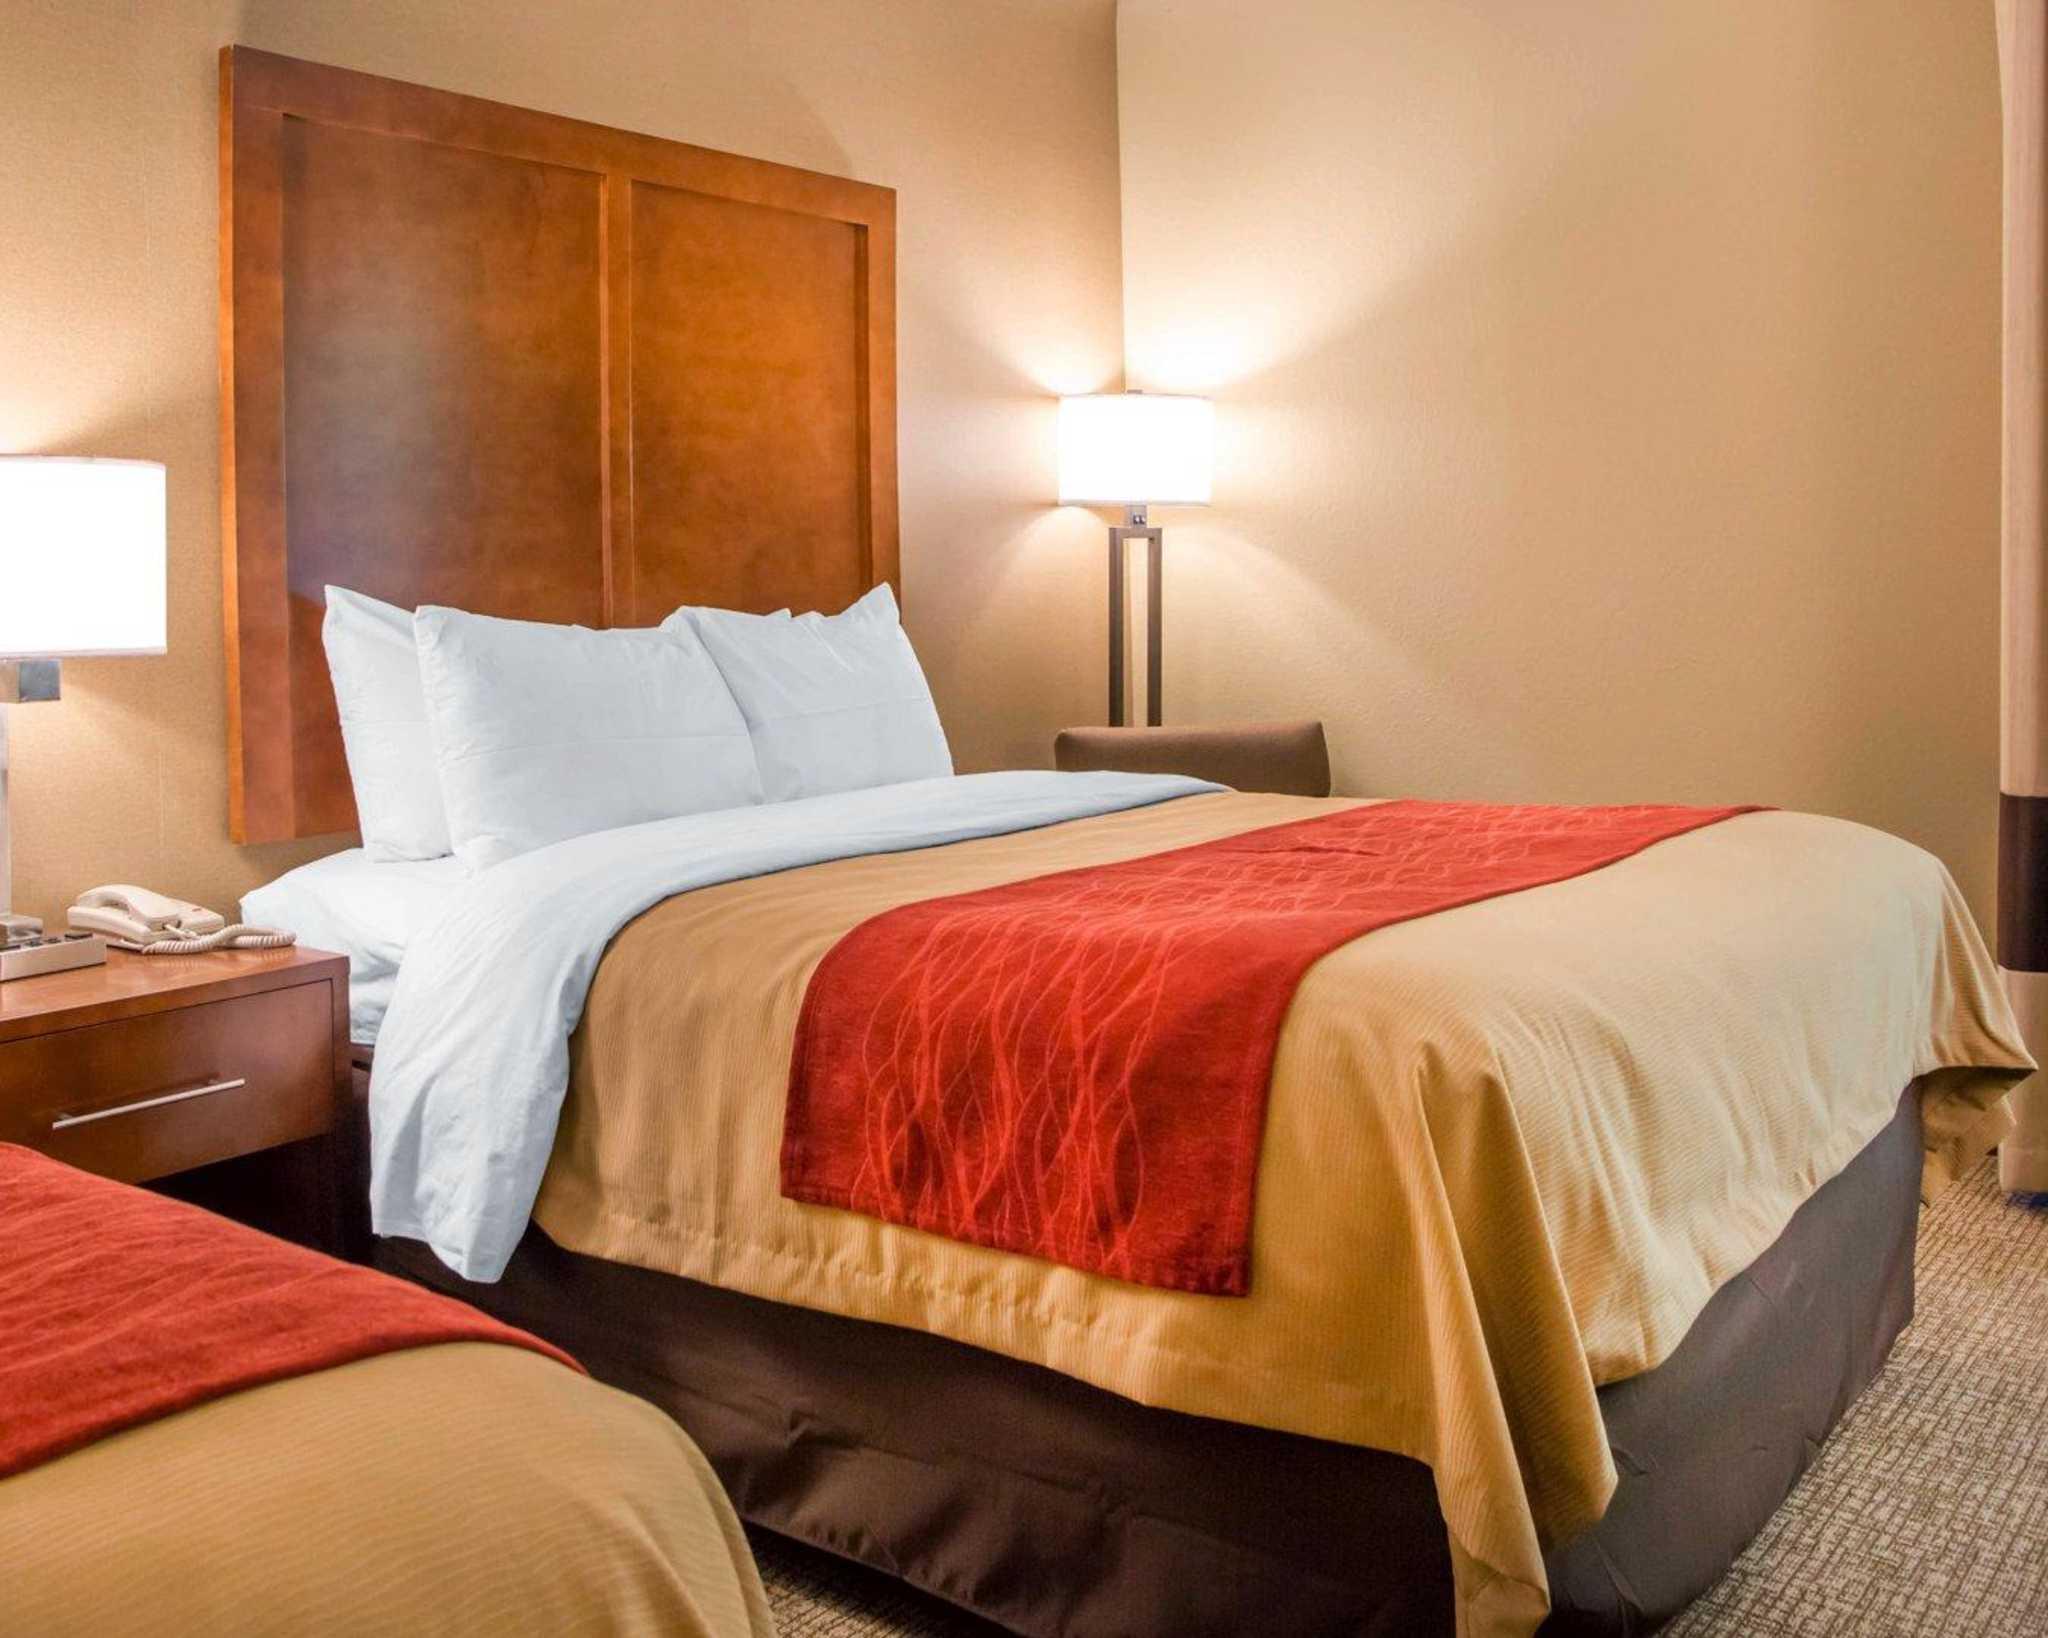 Comfort Inn Dayton - Huber Heights image 14